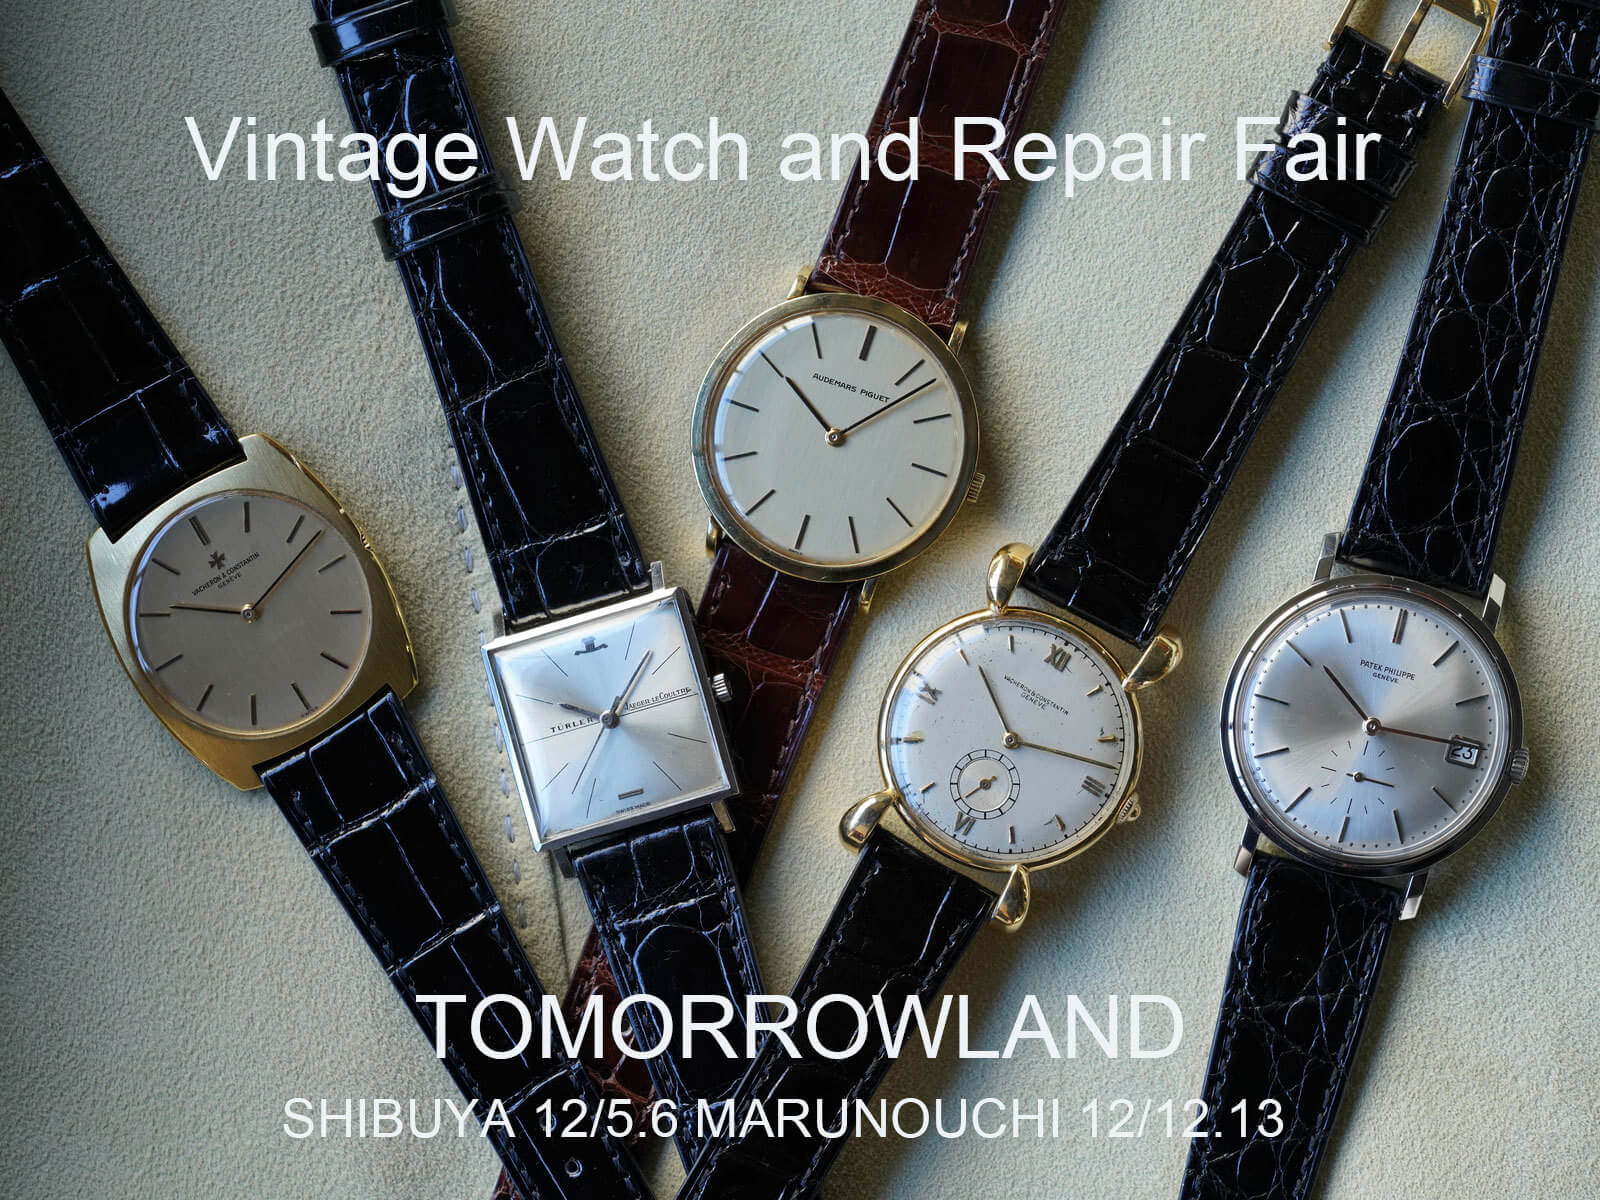 TOMORROWLAND with EGUCHI TOKEI TEN /Vintage Watch and Repair Fair